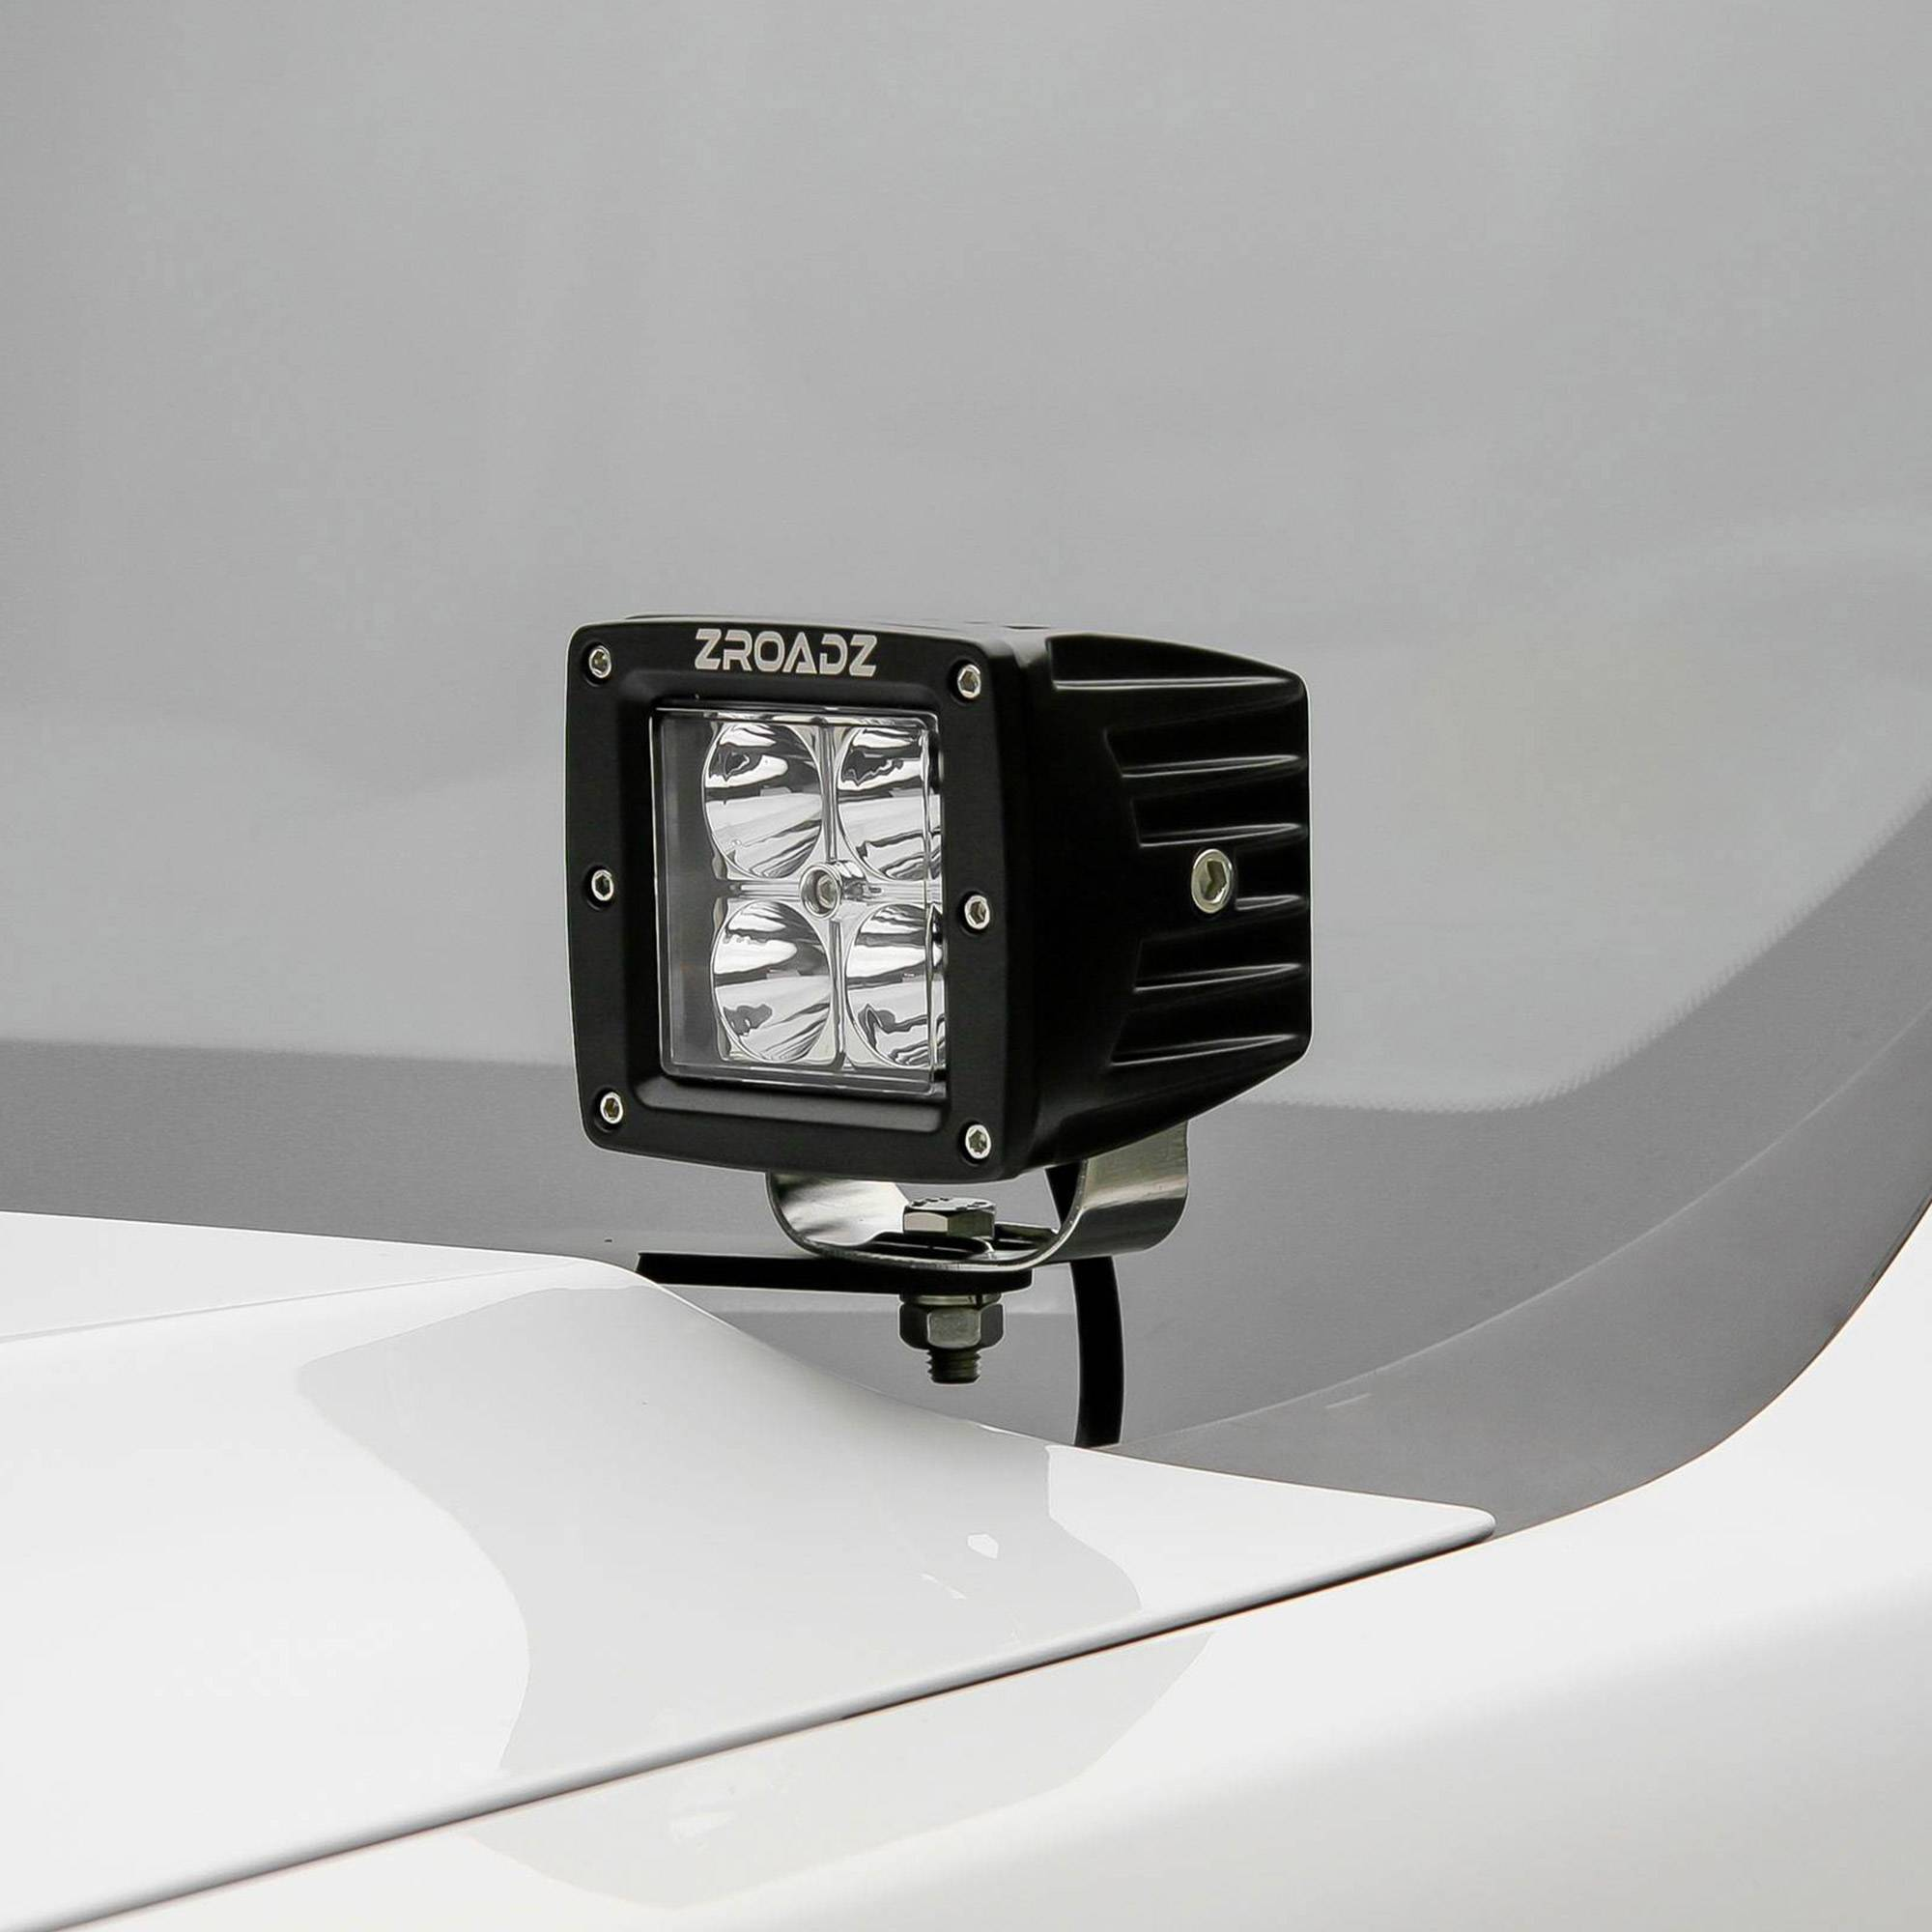 ZROADZ OFF ROAD PRODUCTS - 2008-2010 Ford Super Duty Hood Hinge LED Bracket to mount (2) 3 Inch LED Pod Lights - PN #Z365631